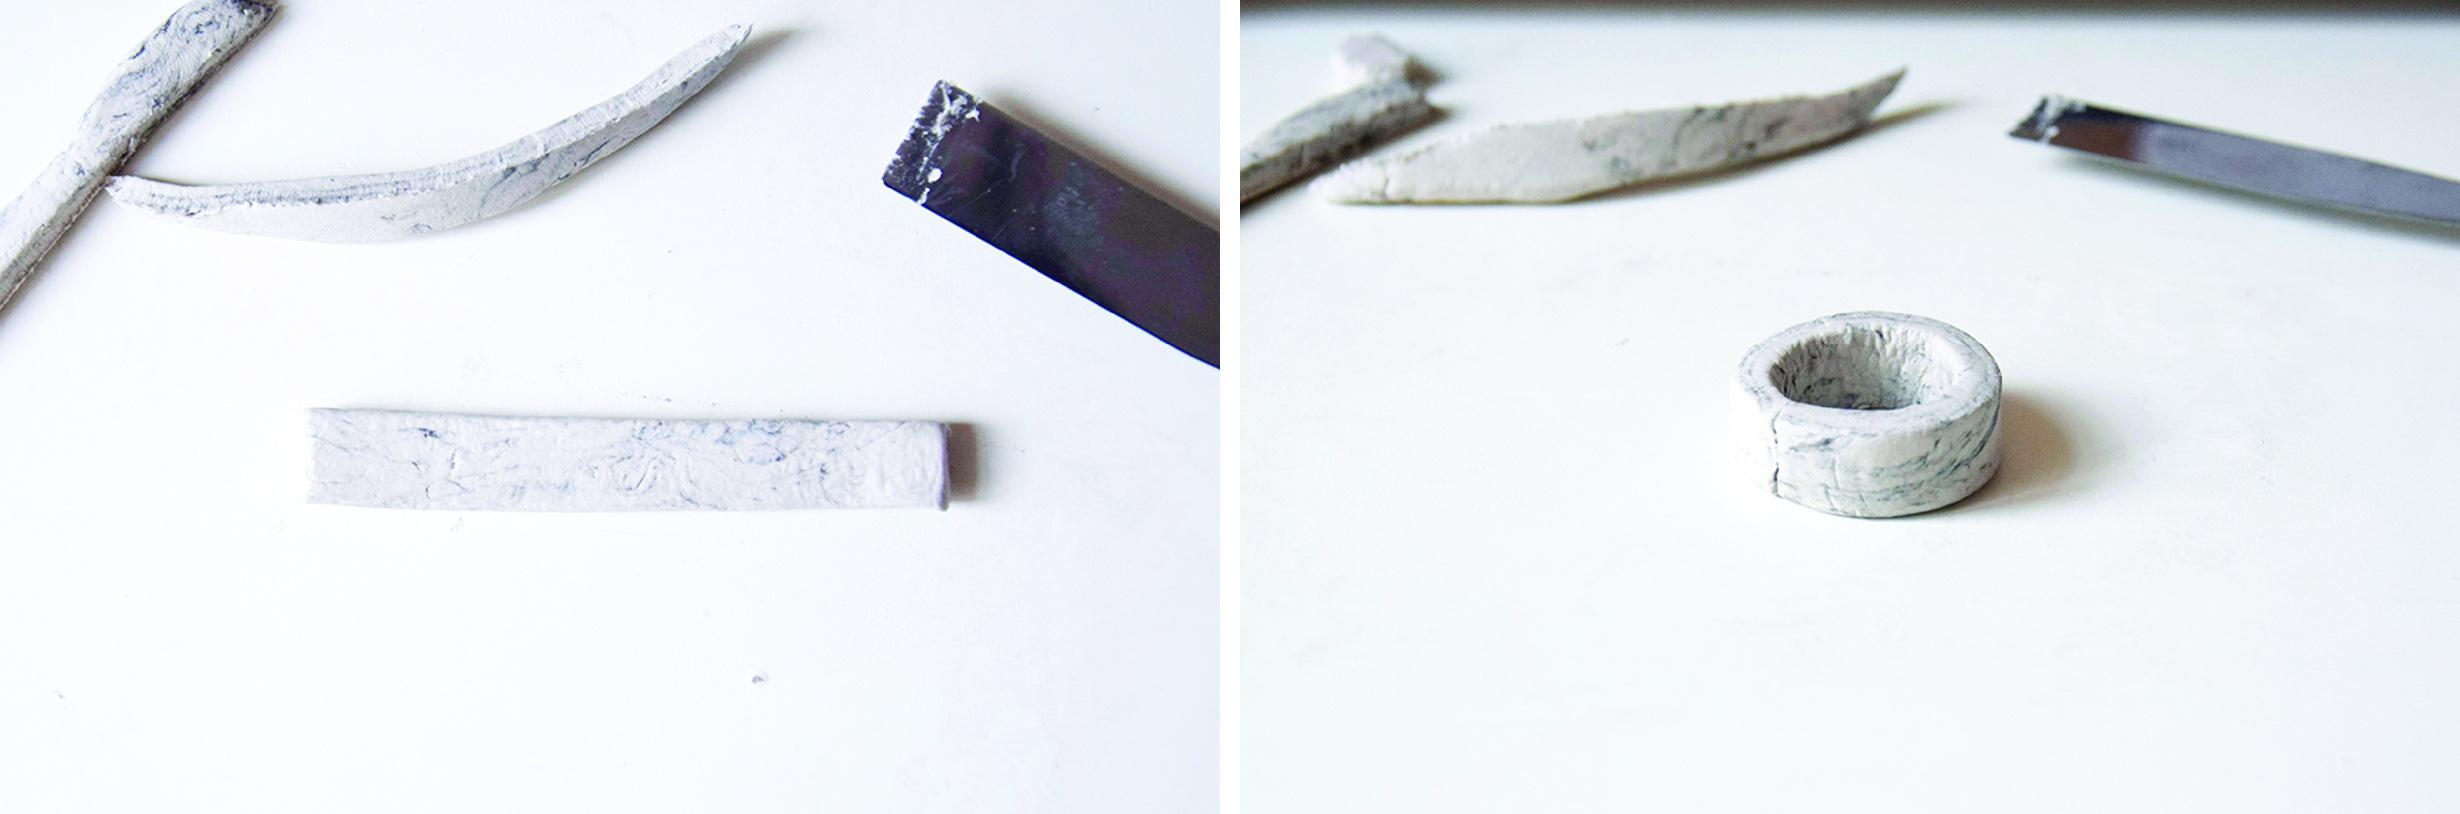 DIY BOUGEOIRS A ANSE cbyclemence.com 04